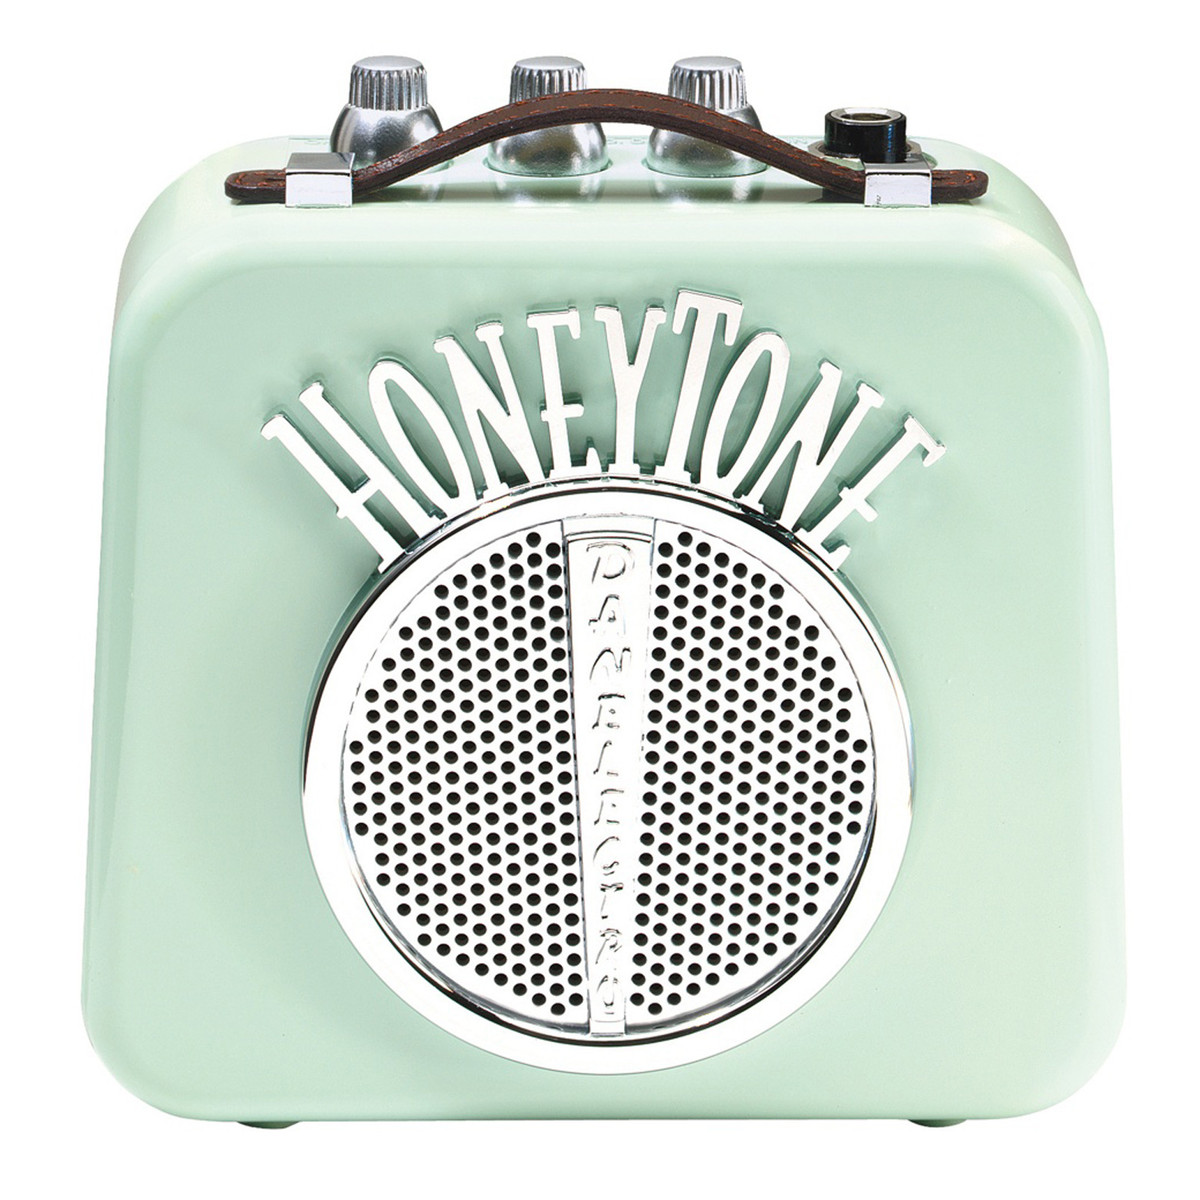 Image of Danelectro Honeytone Mini Amp Aqua